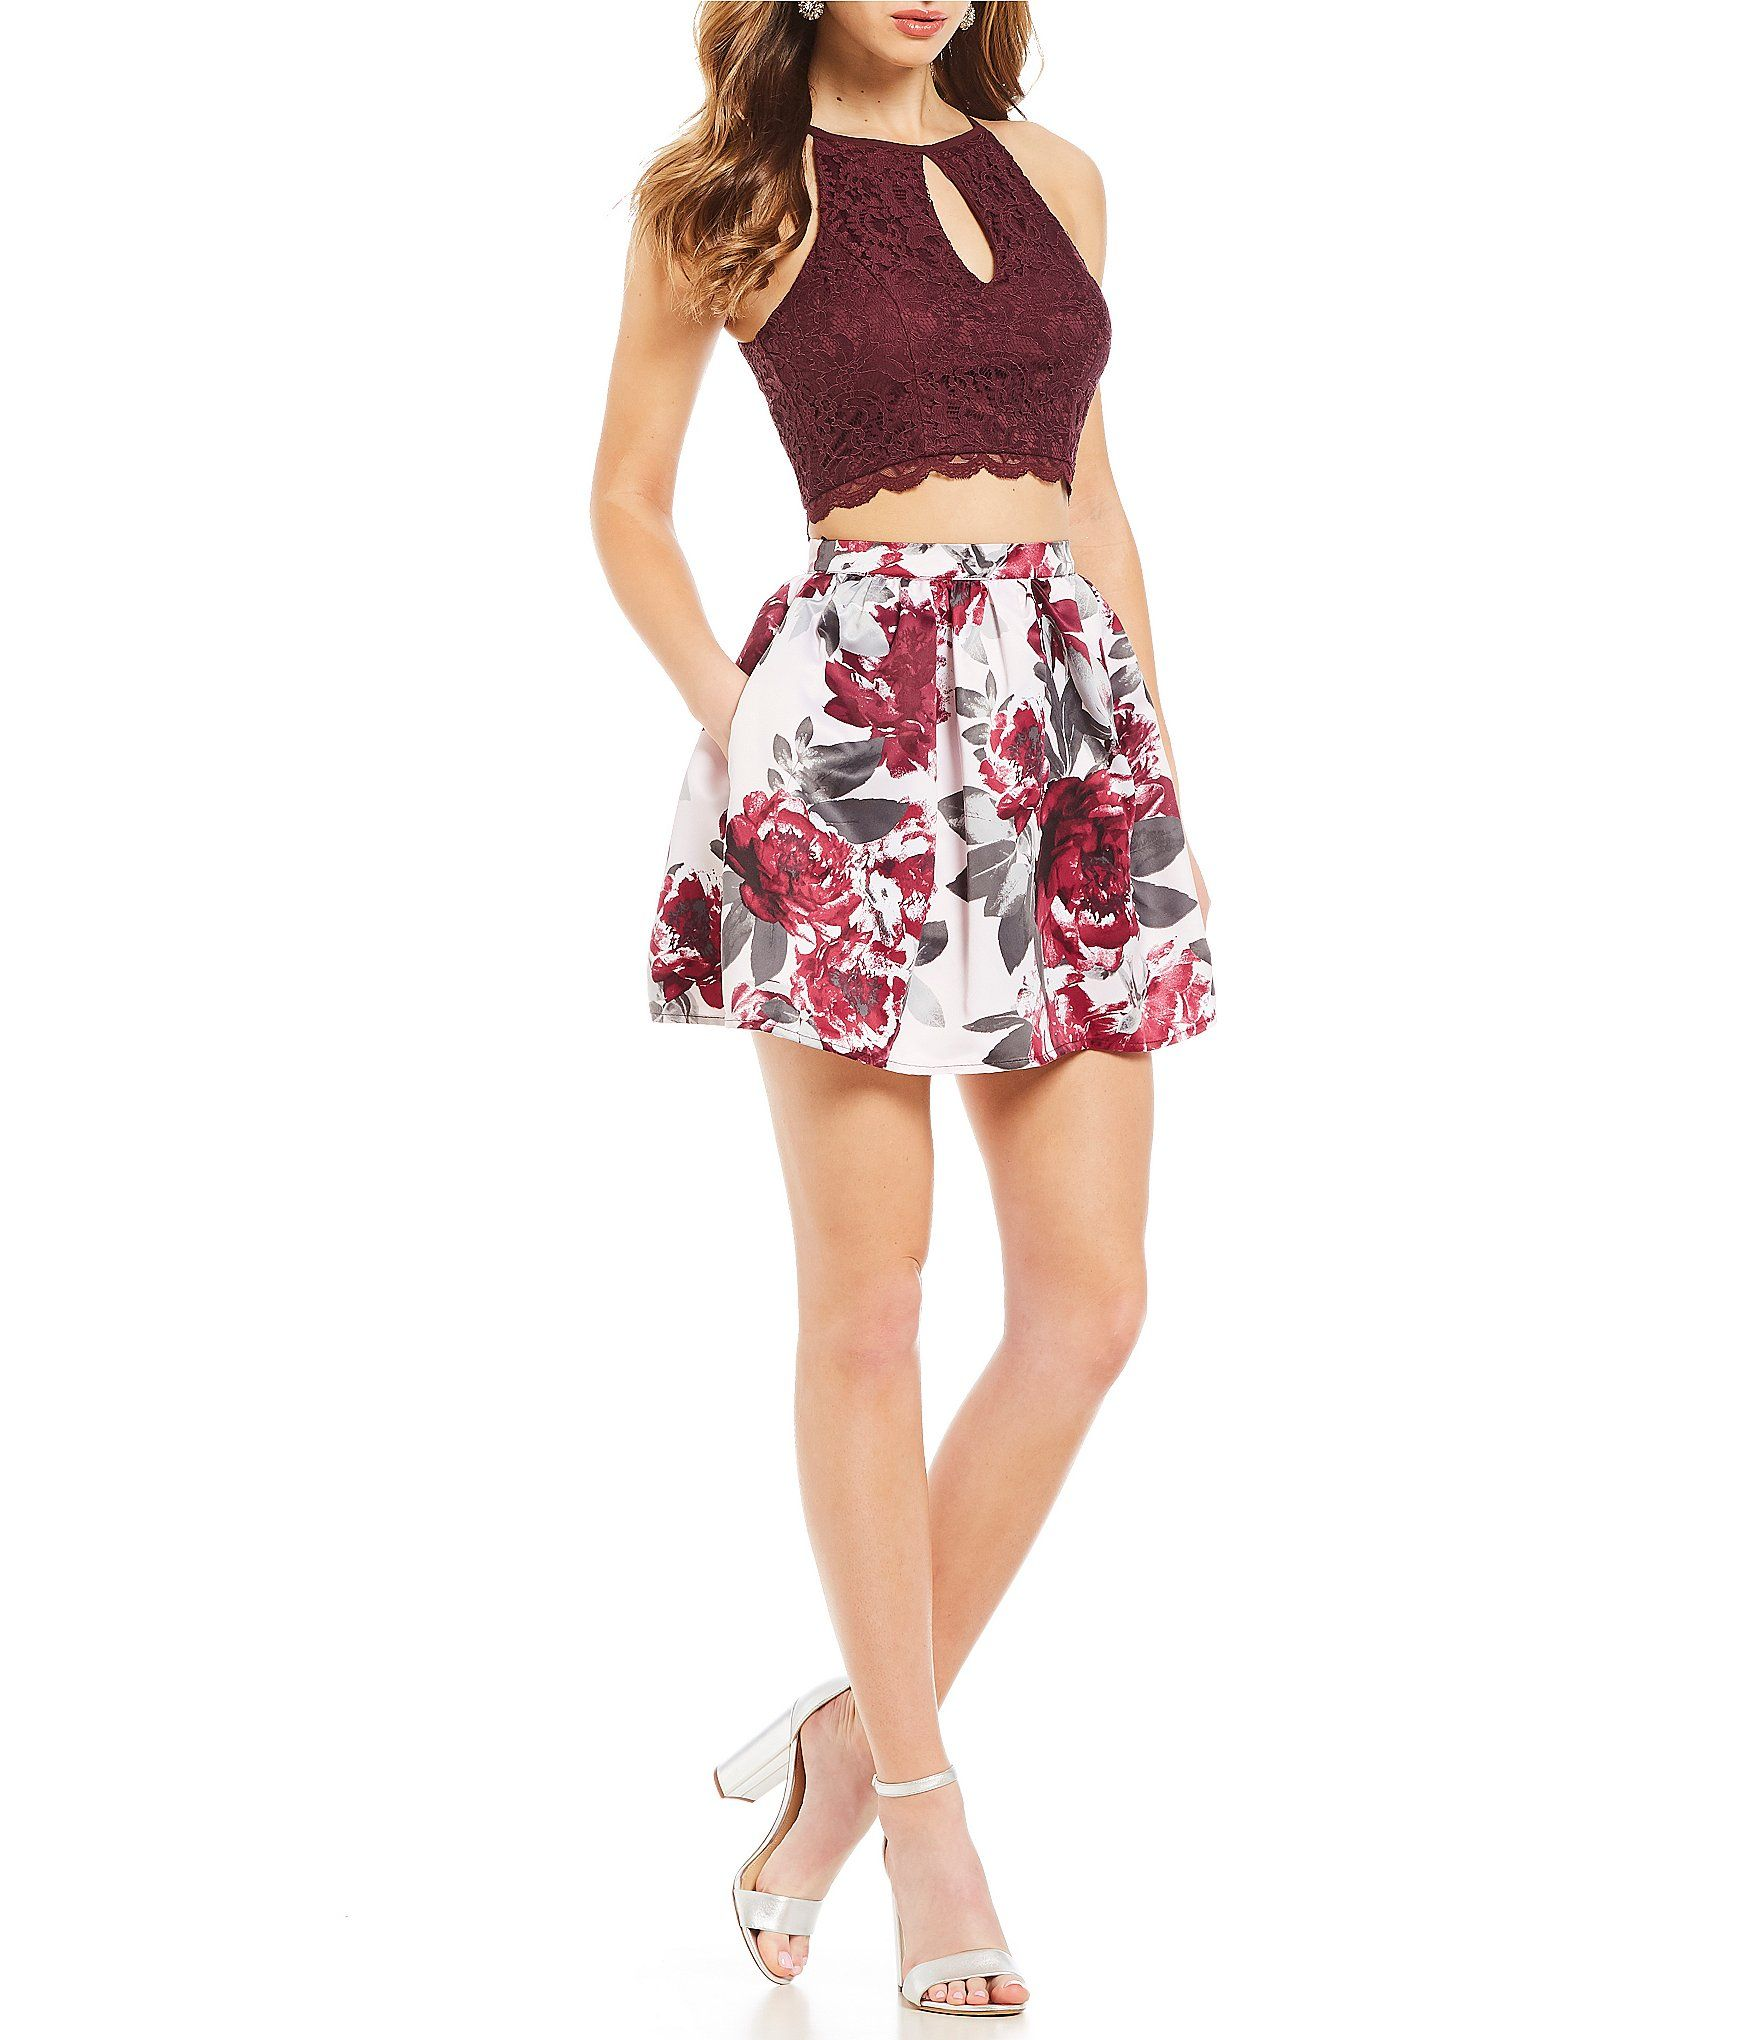 Xtraordinary lace with floralprint satin skirt twopiece dress